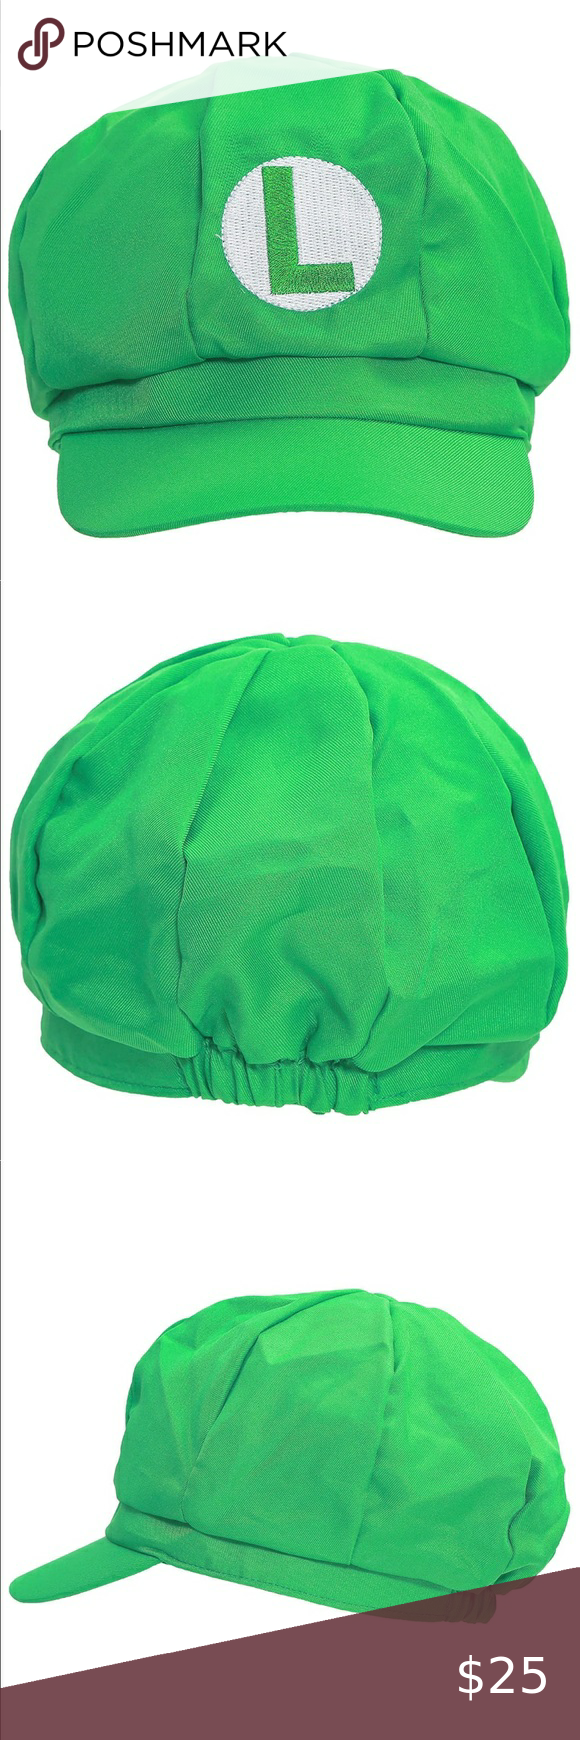 Luigi Hat Nwot Luigi Hat Hats Women Accessories Hats